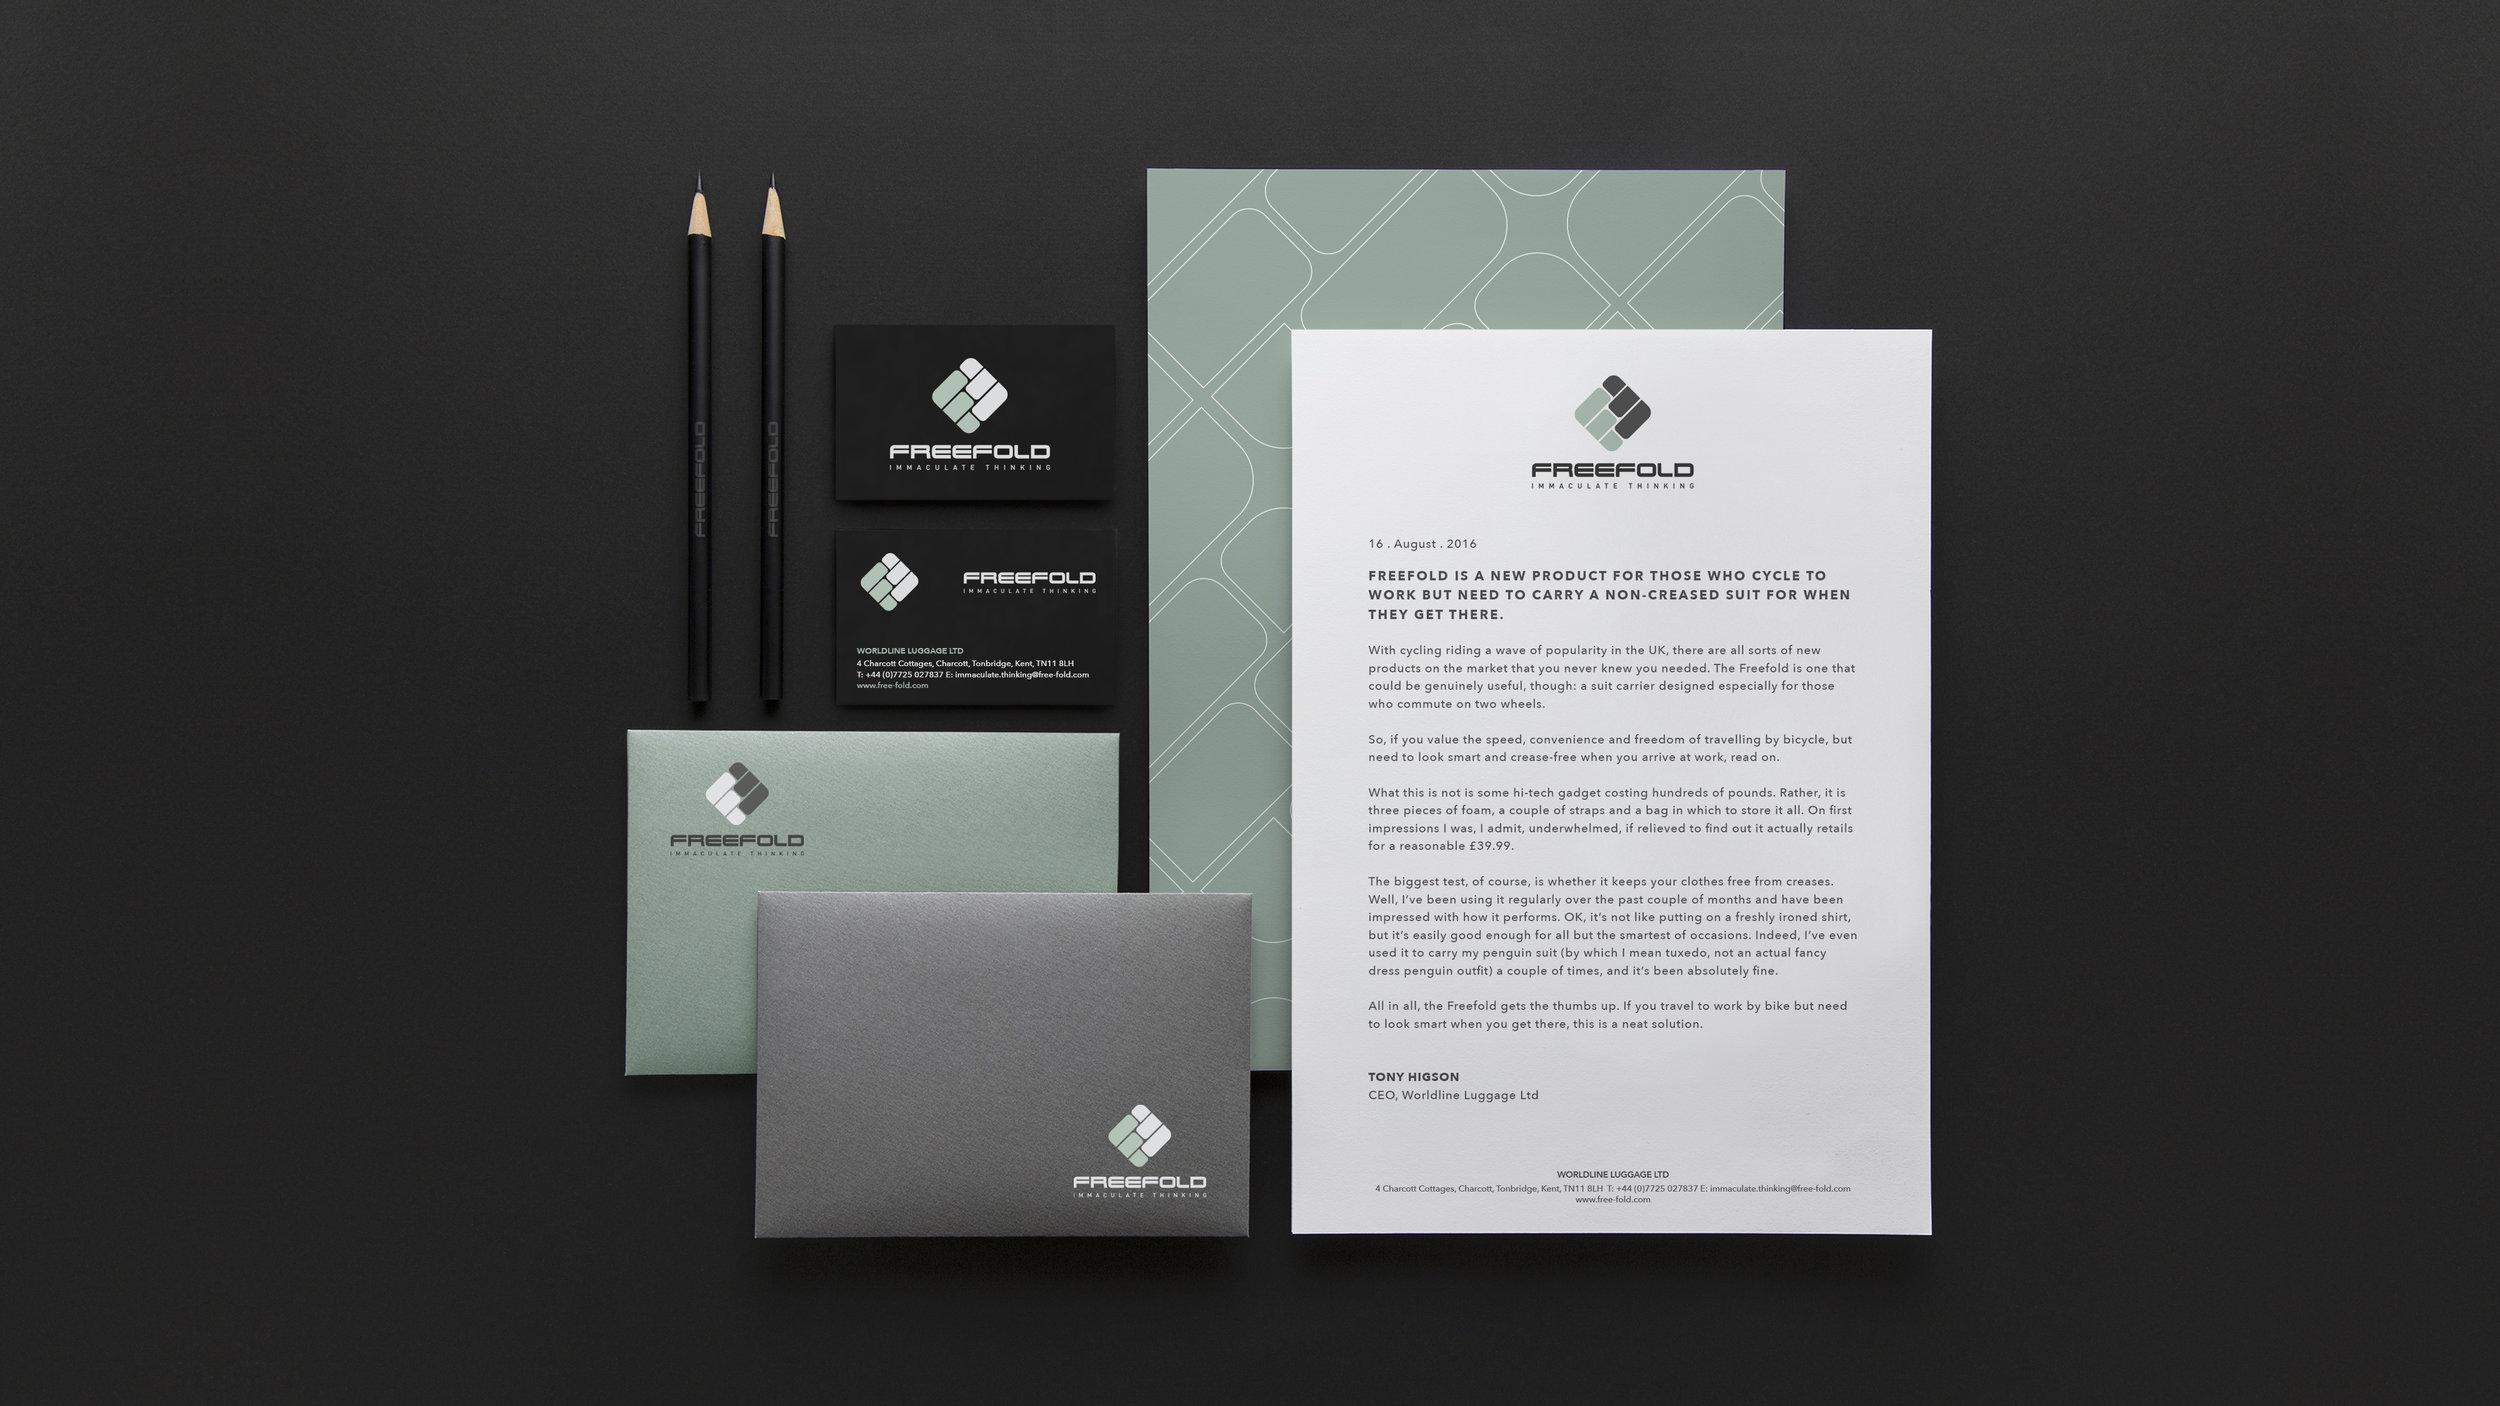 Brand_republica_stationery_design_freefold.jpg